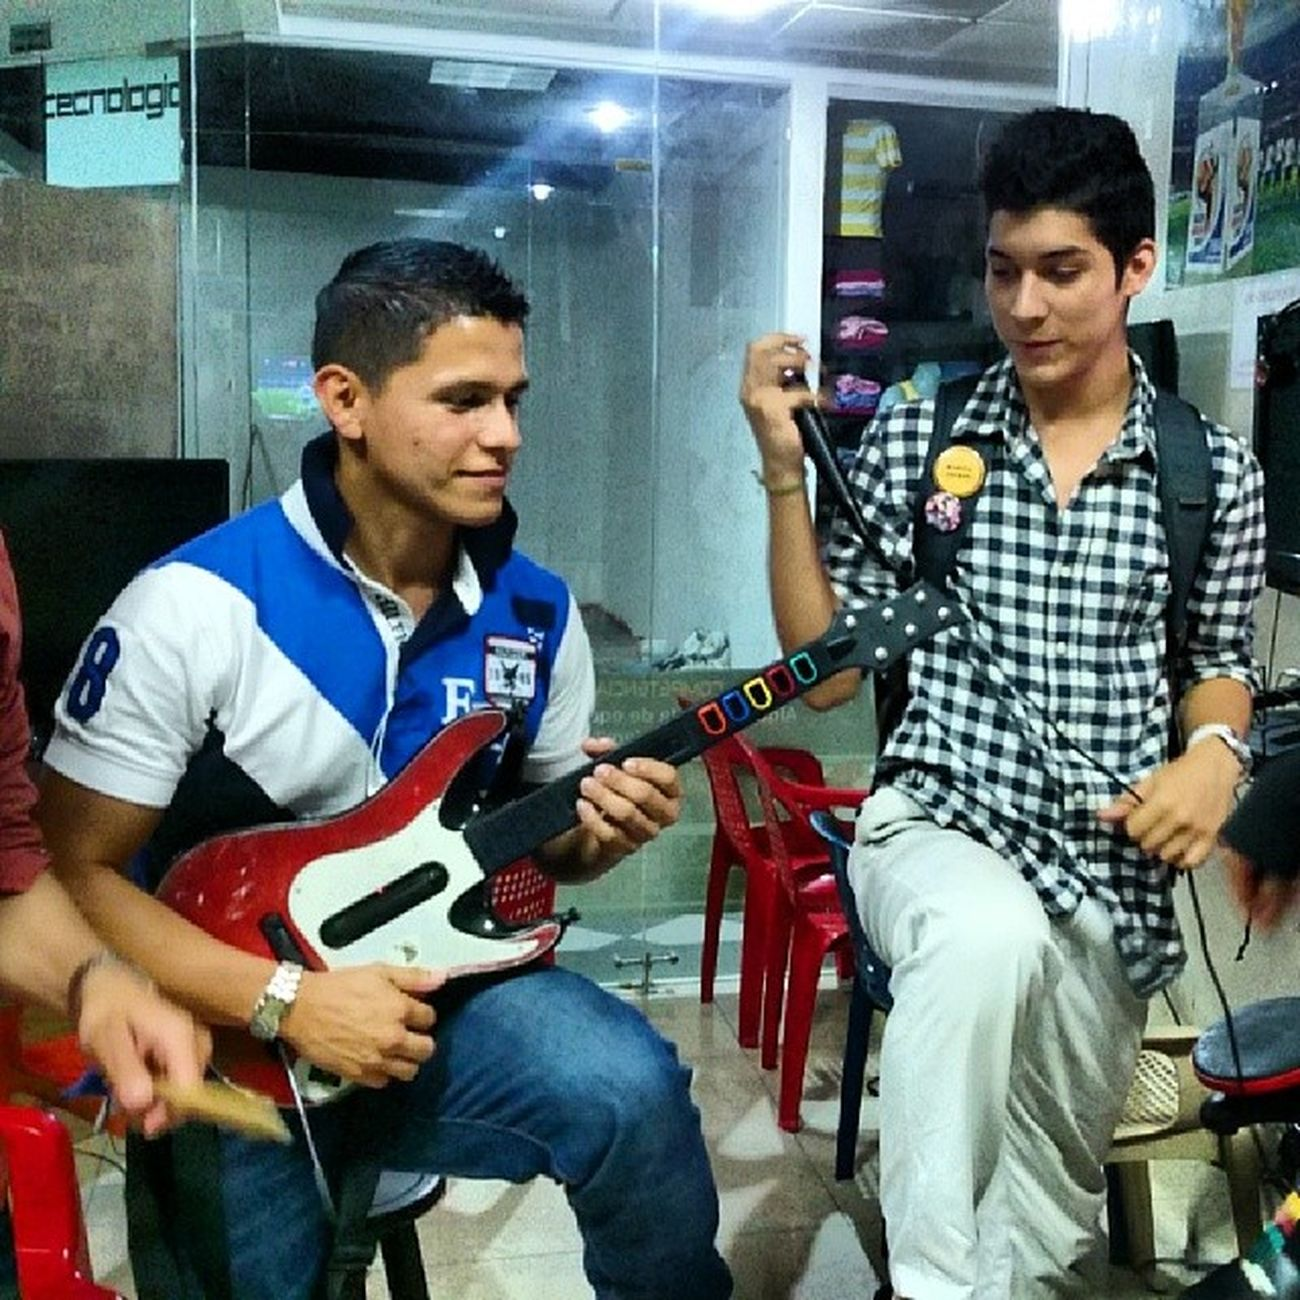 Guitarhero Guitar Vocals Buena tarde.